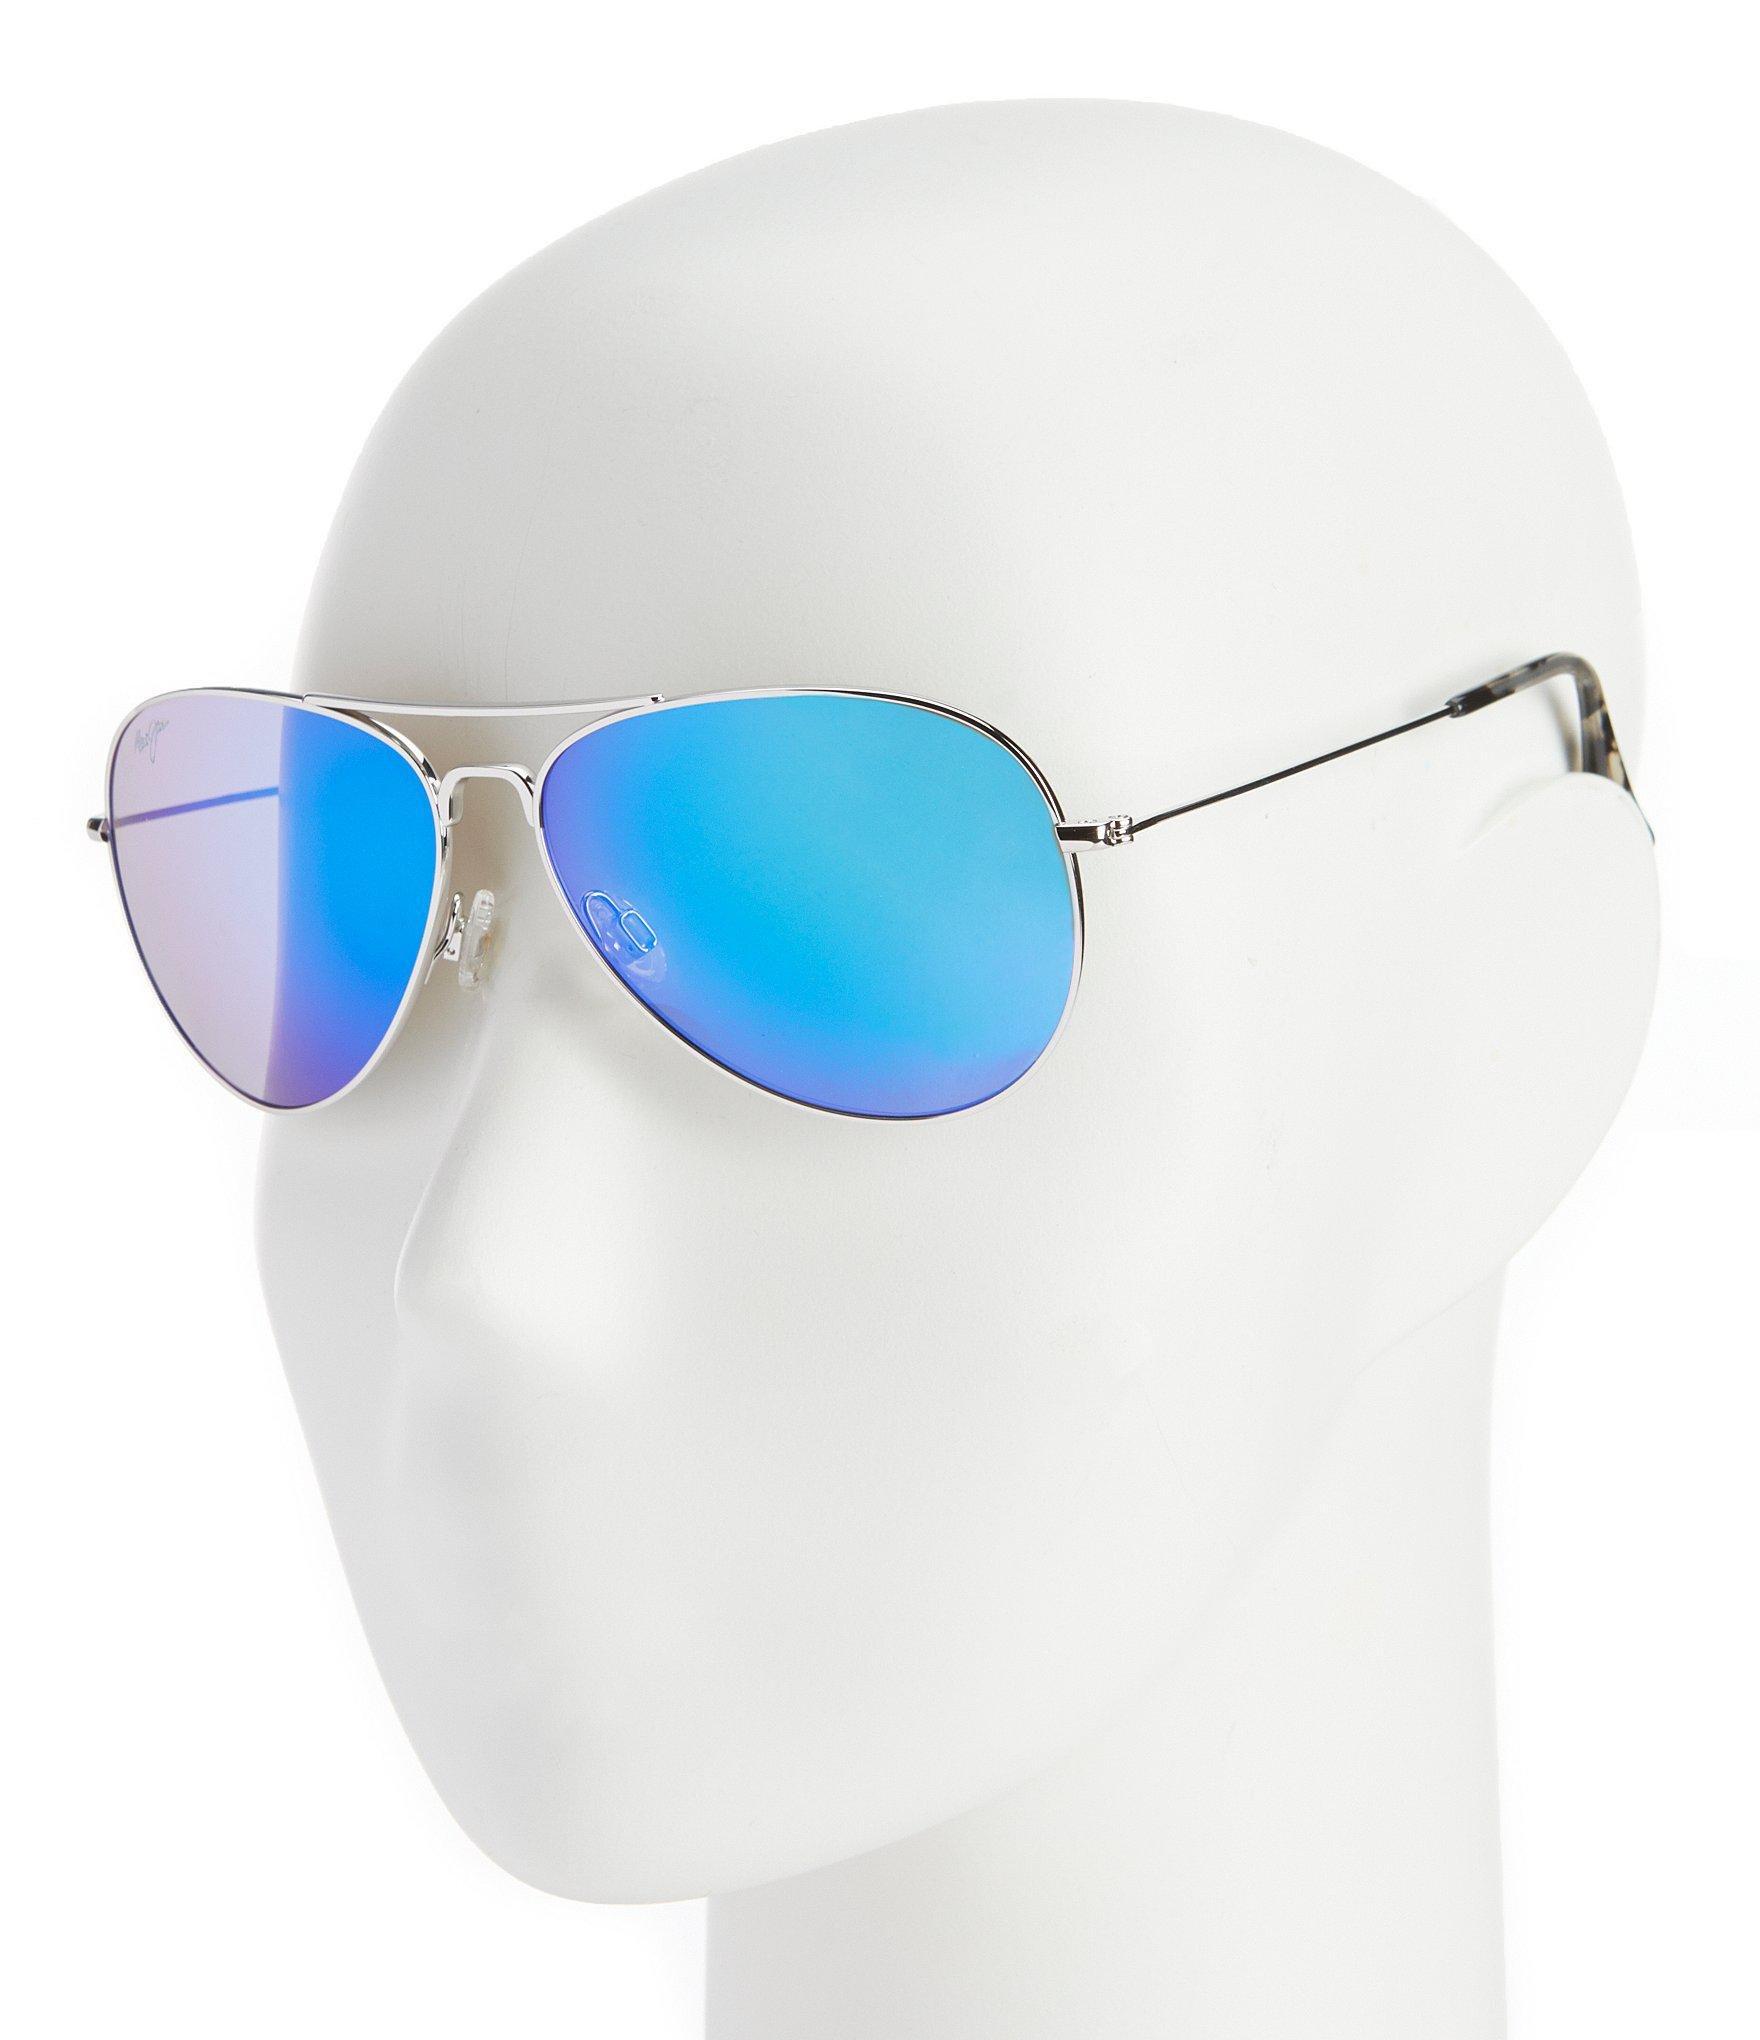 a1cc93f473b7d Lyst - Maui Jim Mavericks Polarized Mirrored Aviator Sunglasses in ...